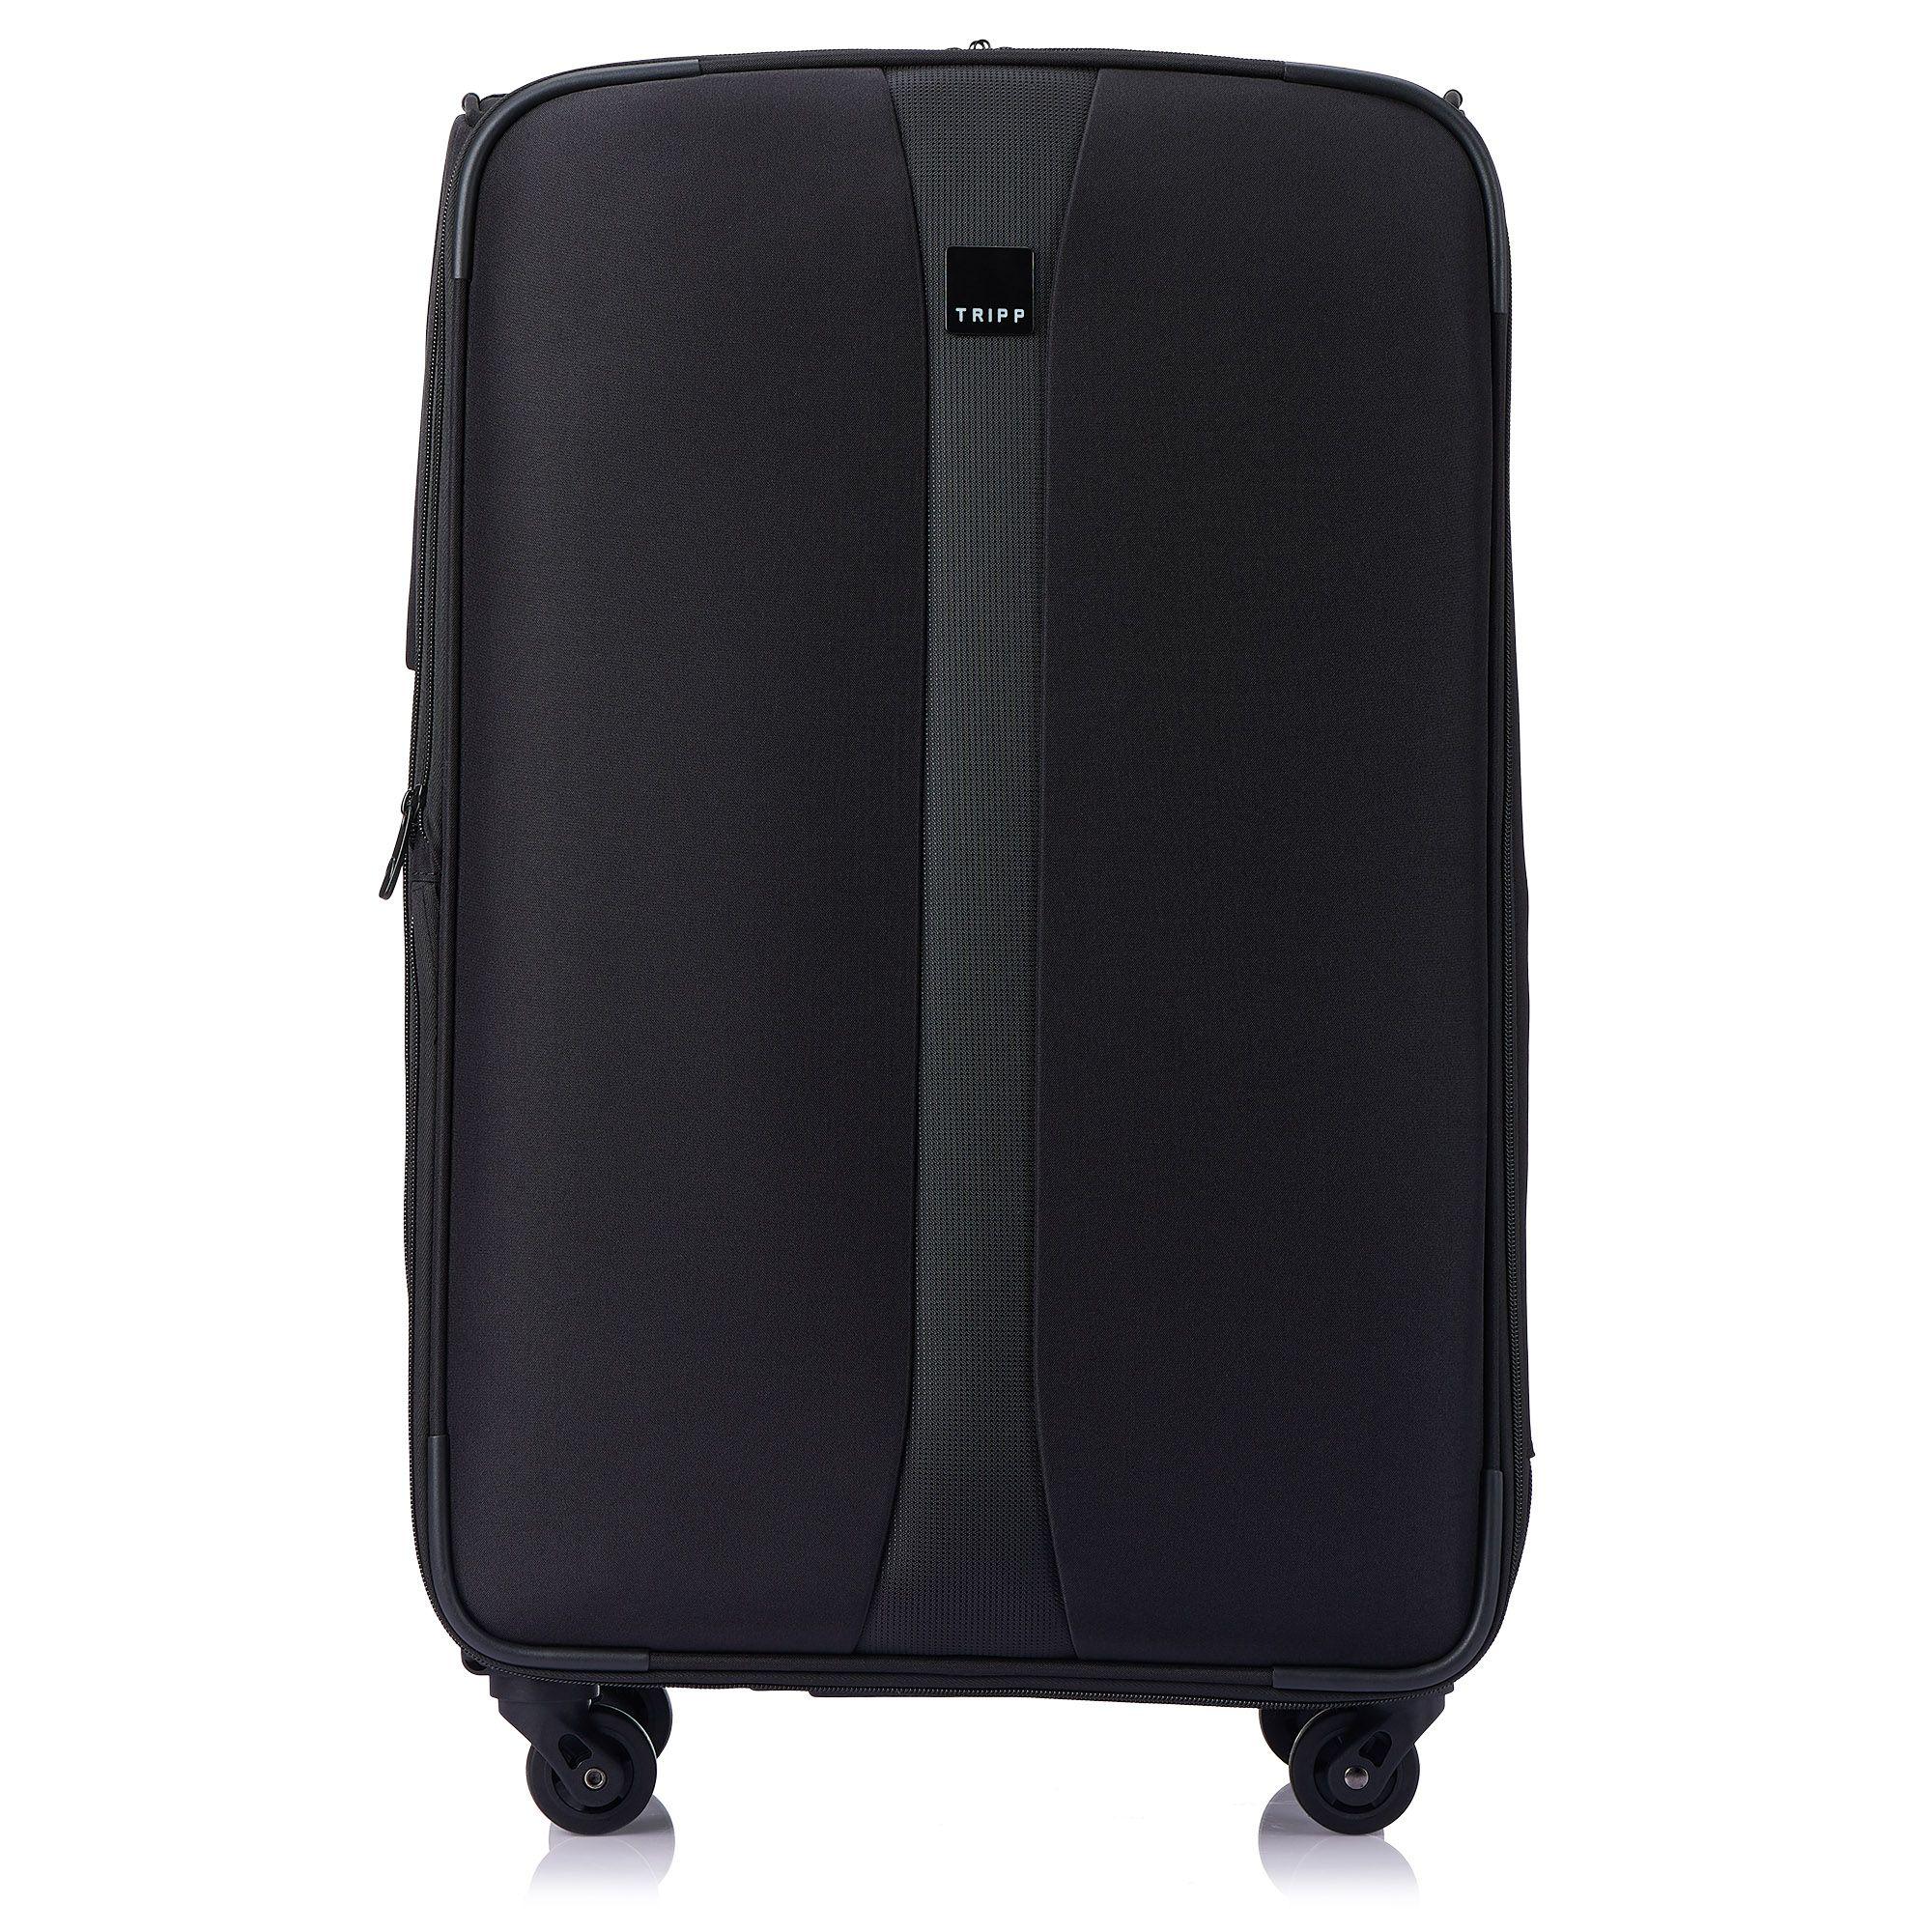 tripp black 39 superlite 4w 39 4 wheel medium suitcase soft. Black Bedroom Furniture Sets. Home Design Ideas